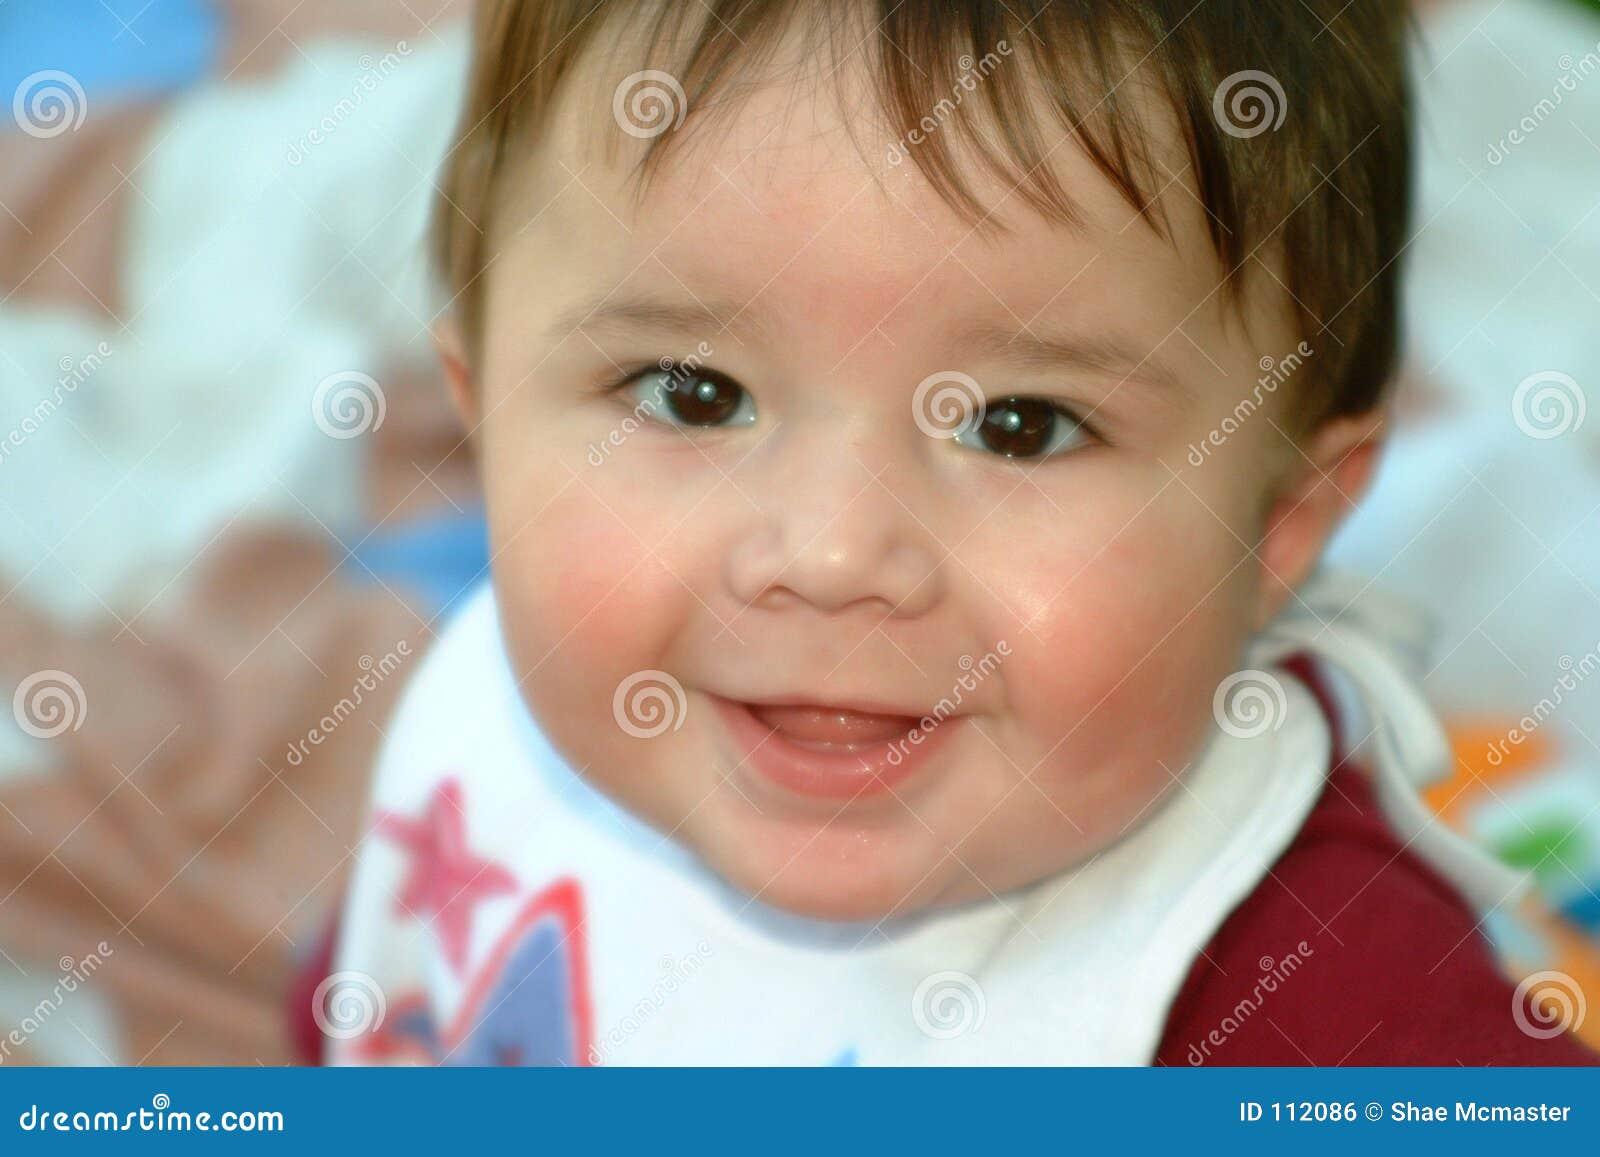 Children-Baby Smiling 2